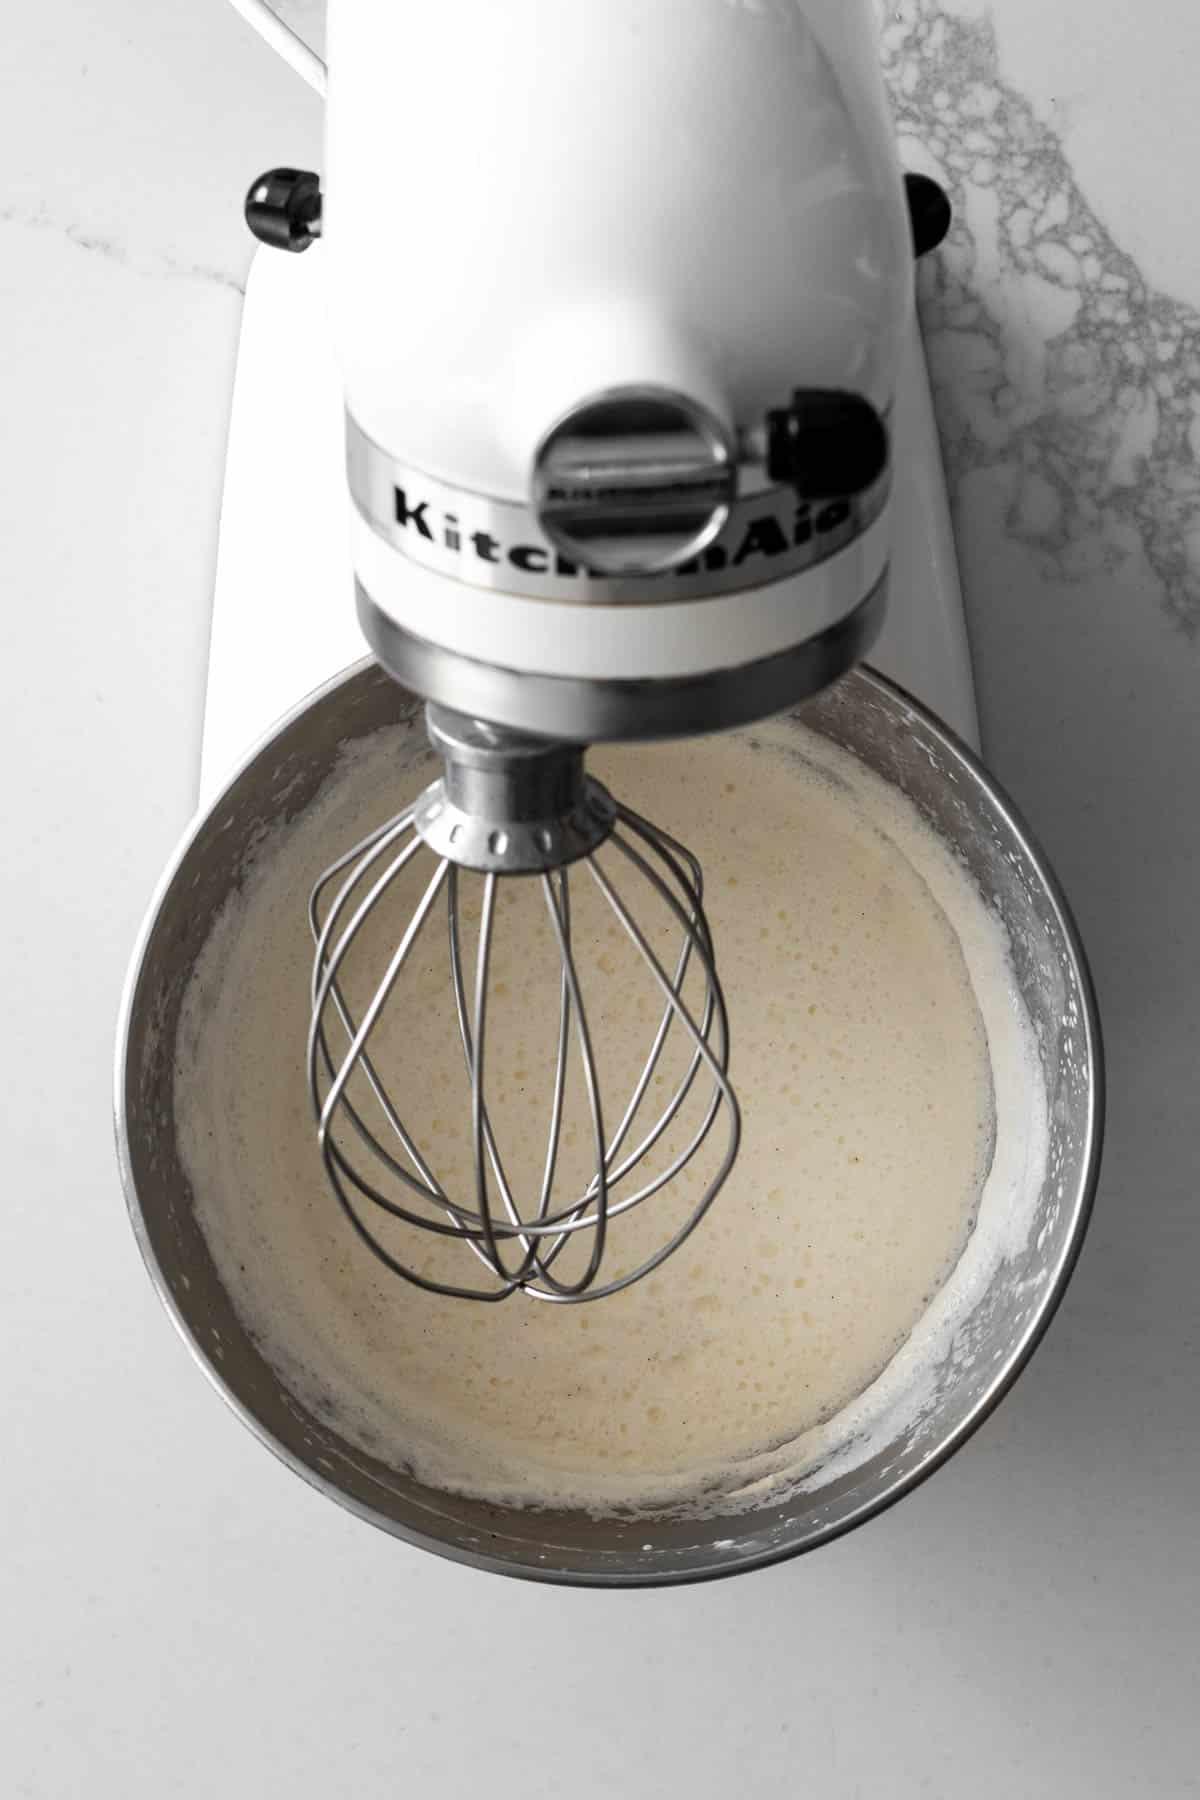 Partially frozen ice cream in a white kitchen-aid mixer